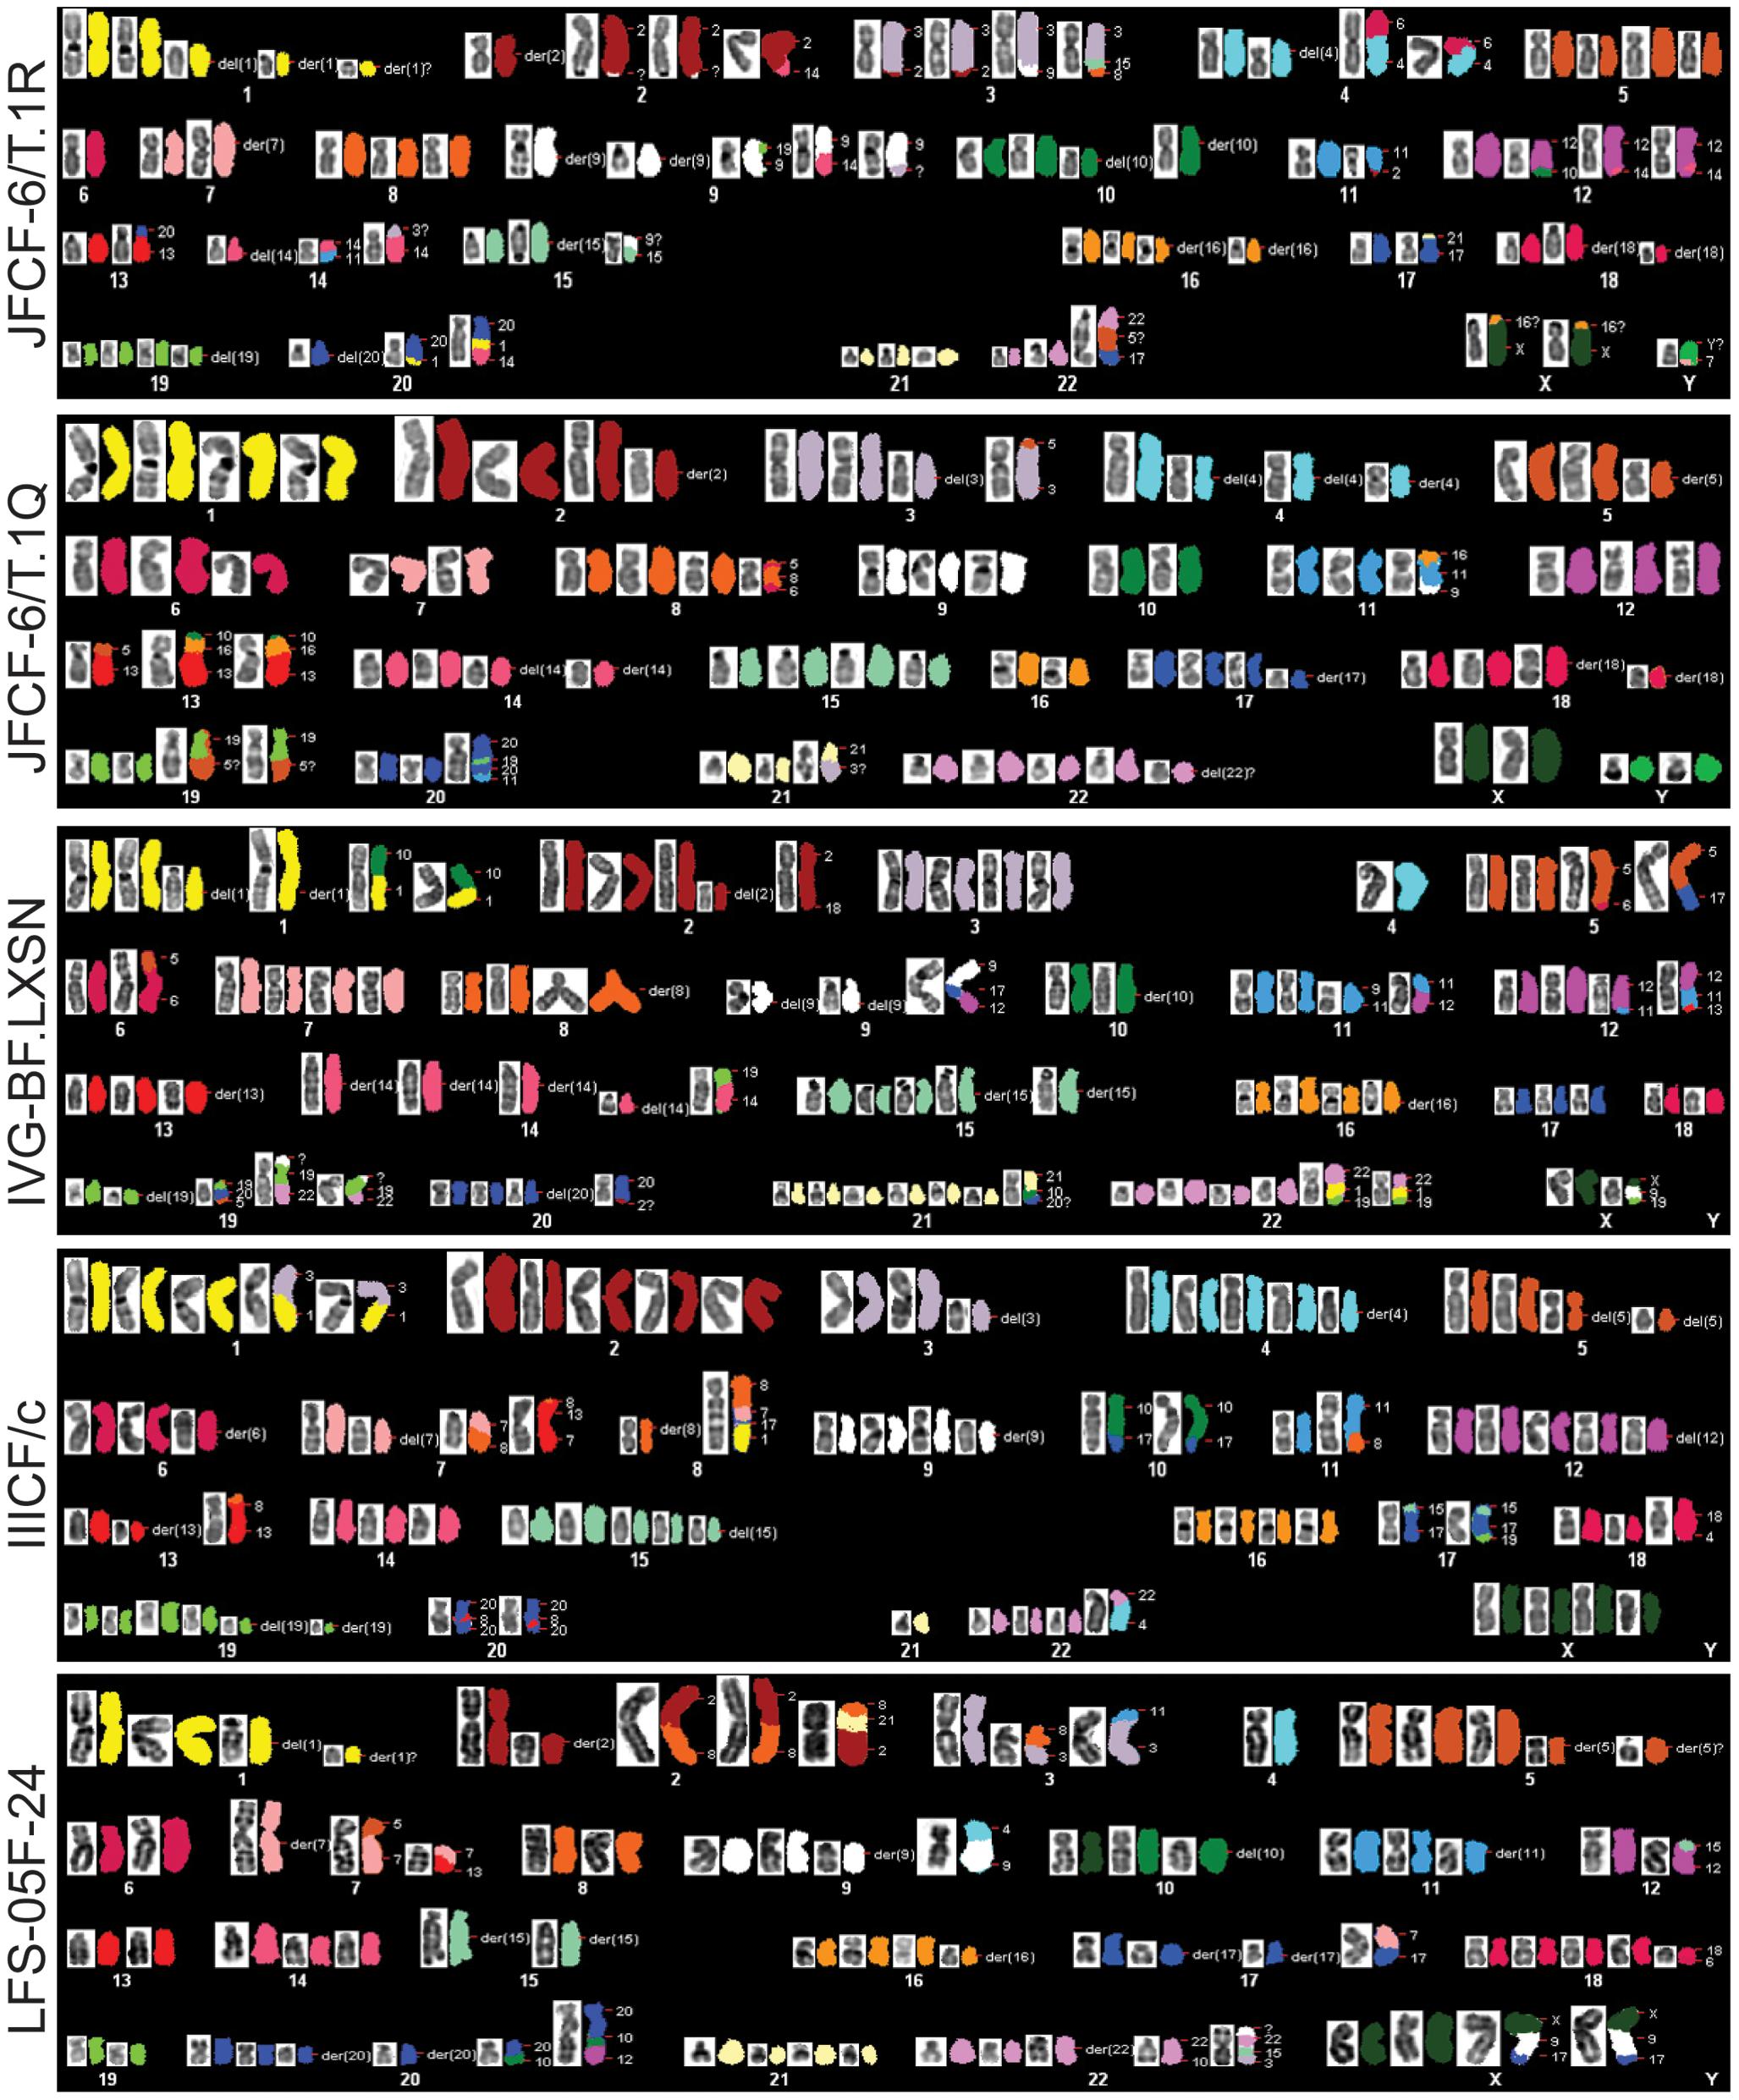 Abnormal karyotypes in ALT lines.